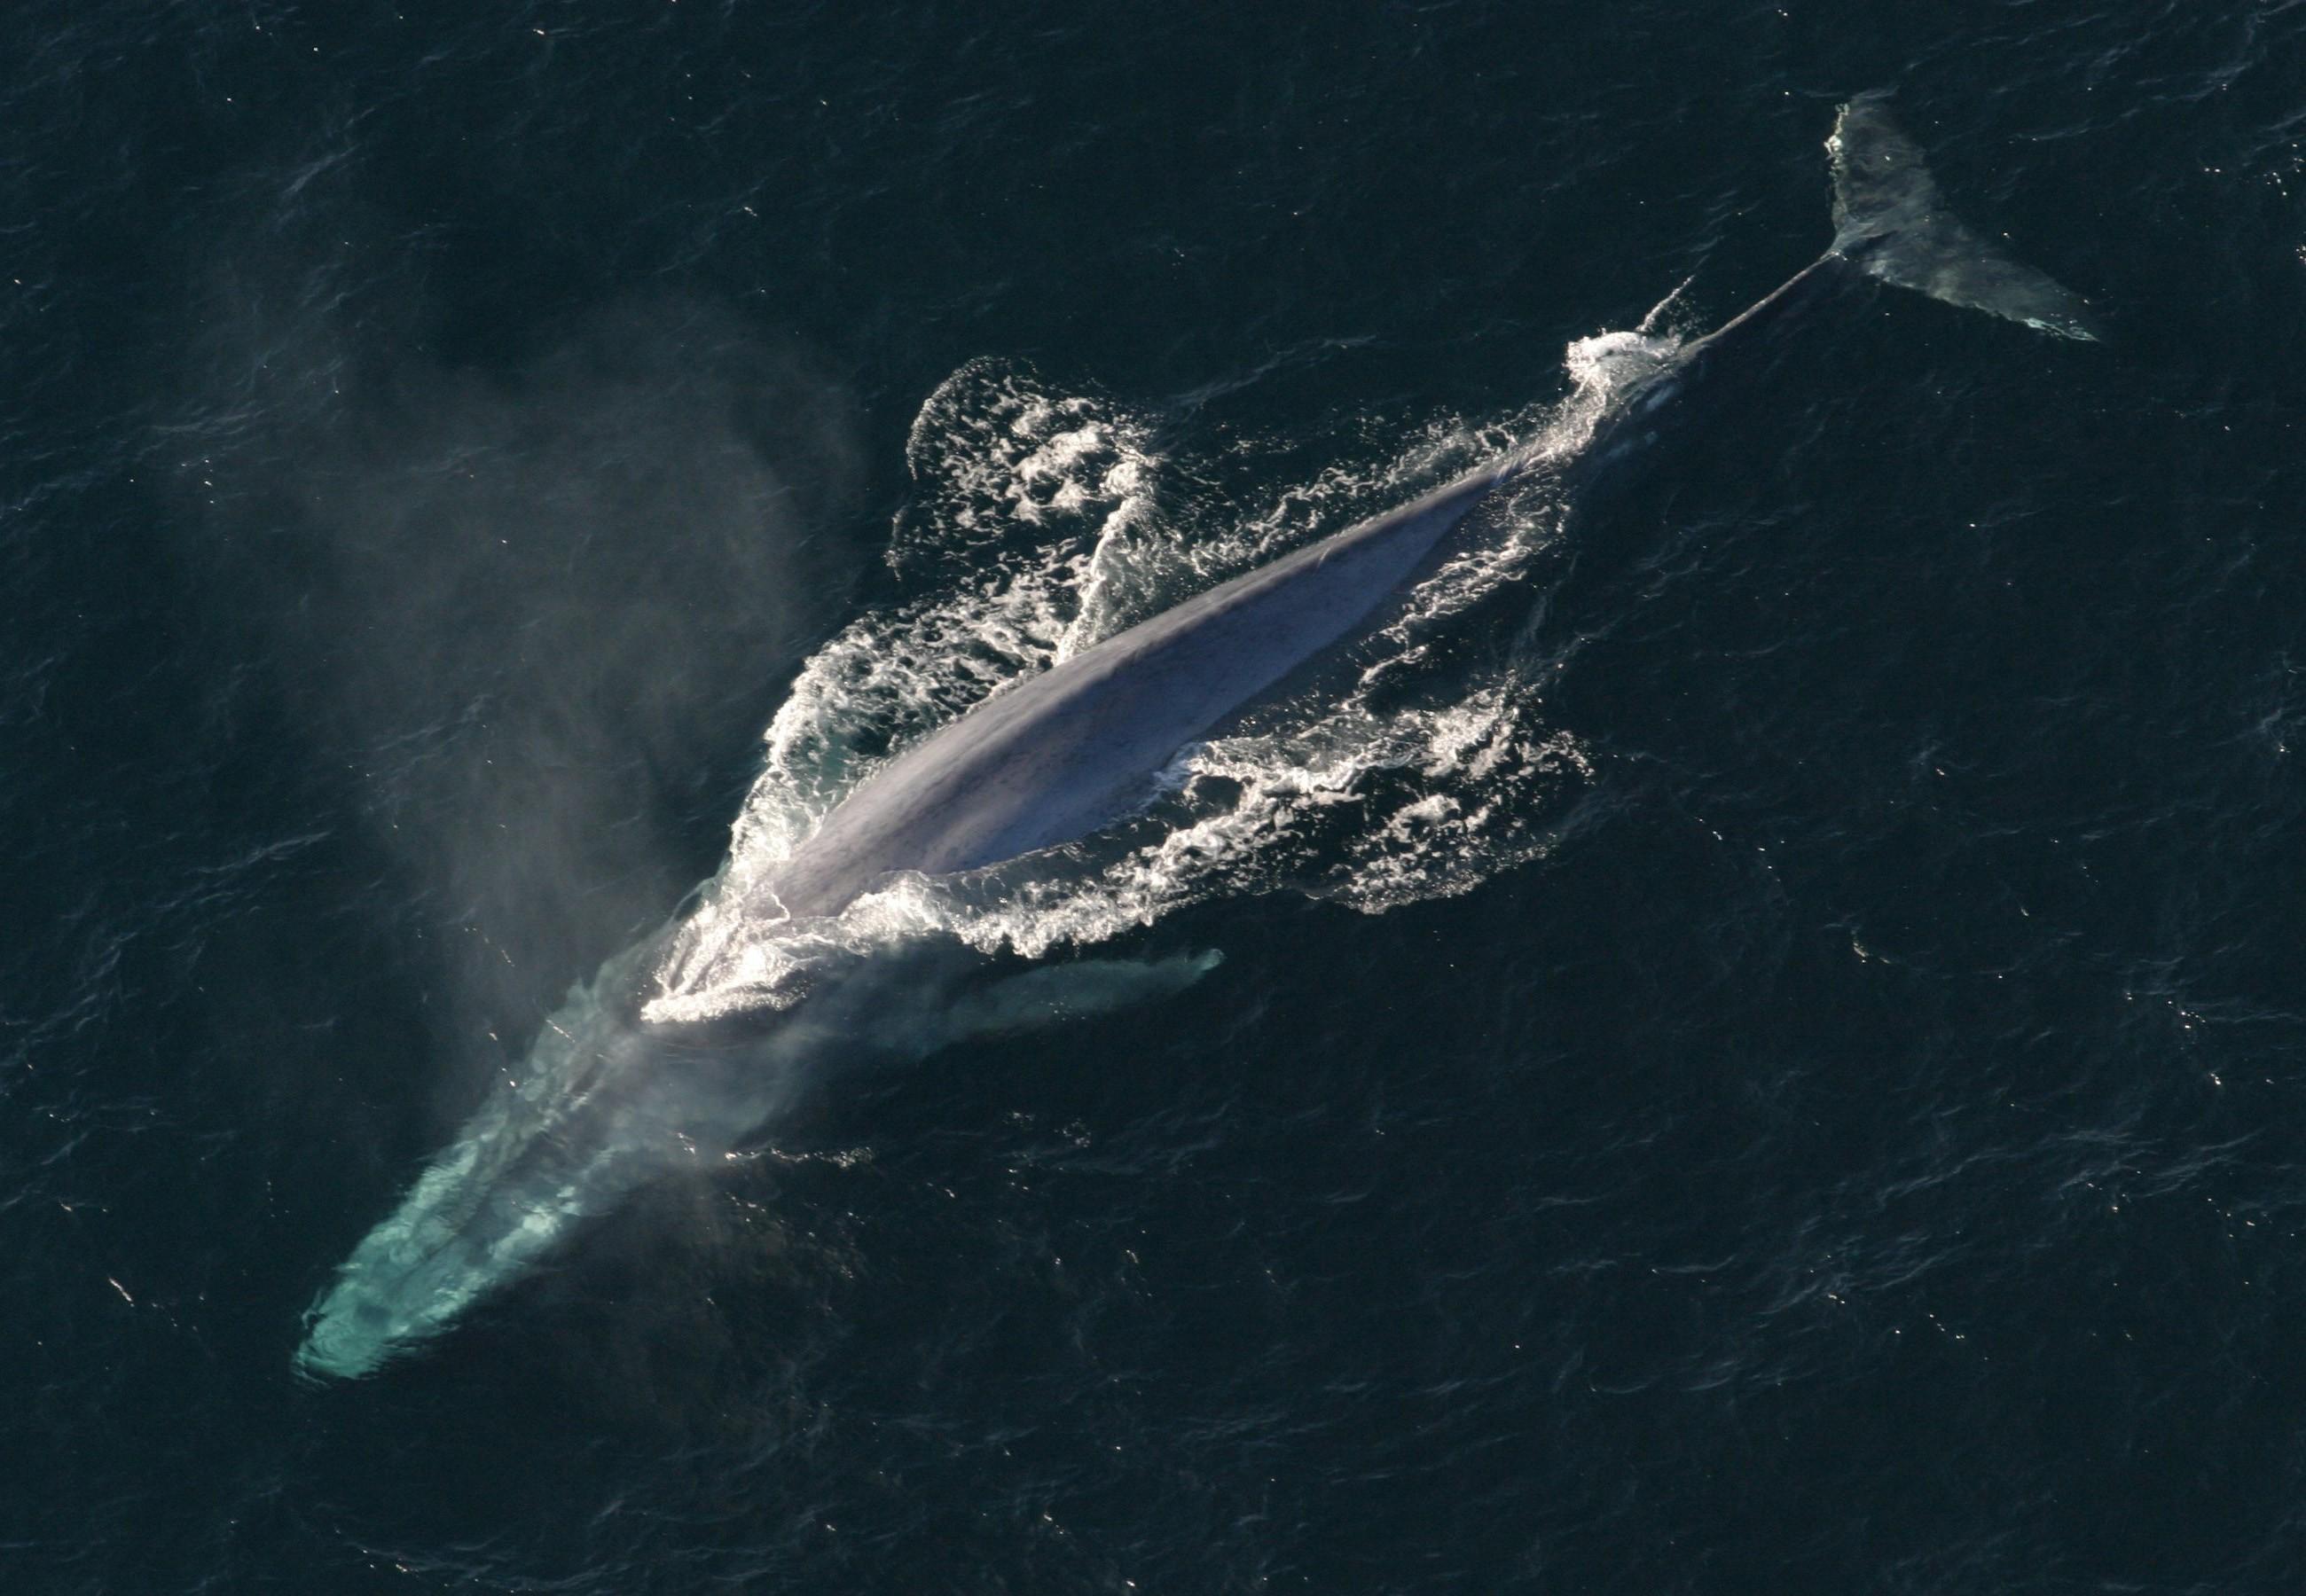 (Foto: Wikimedia/NOAA Photo Library - anim1754)